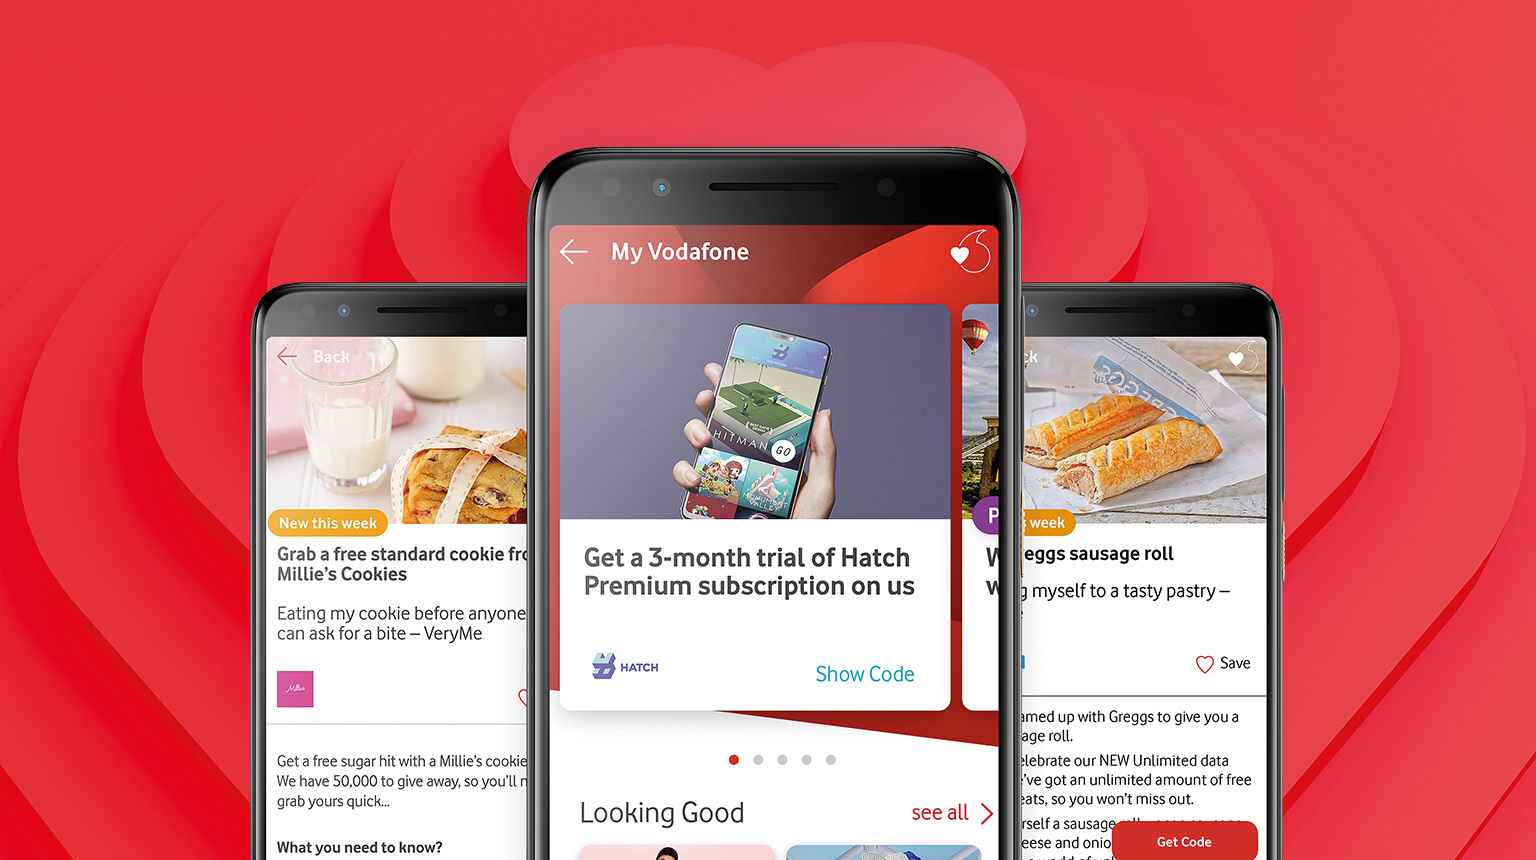 VeryMe Rewards from Vodafone